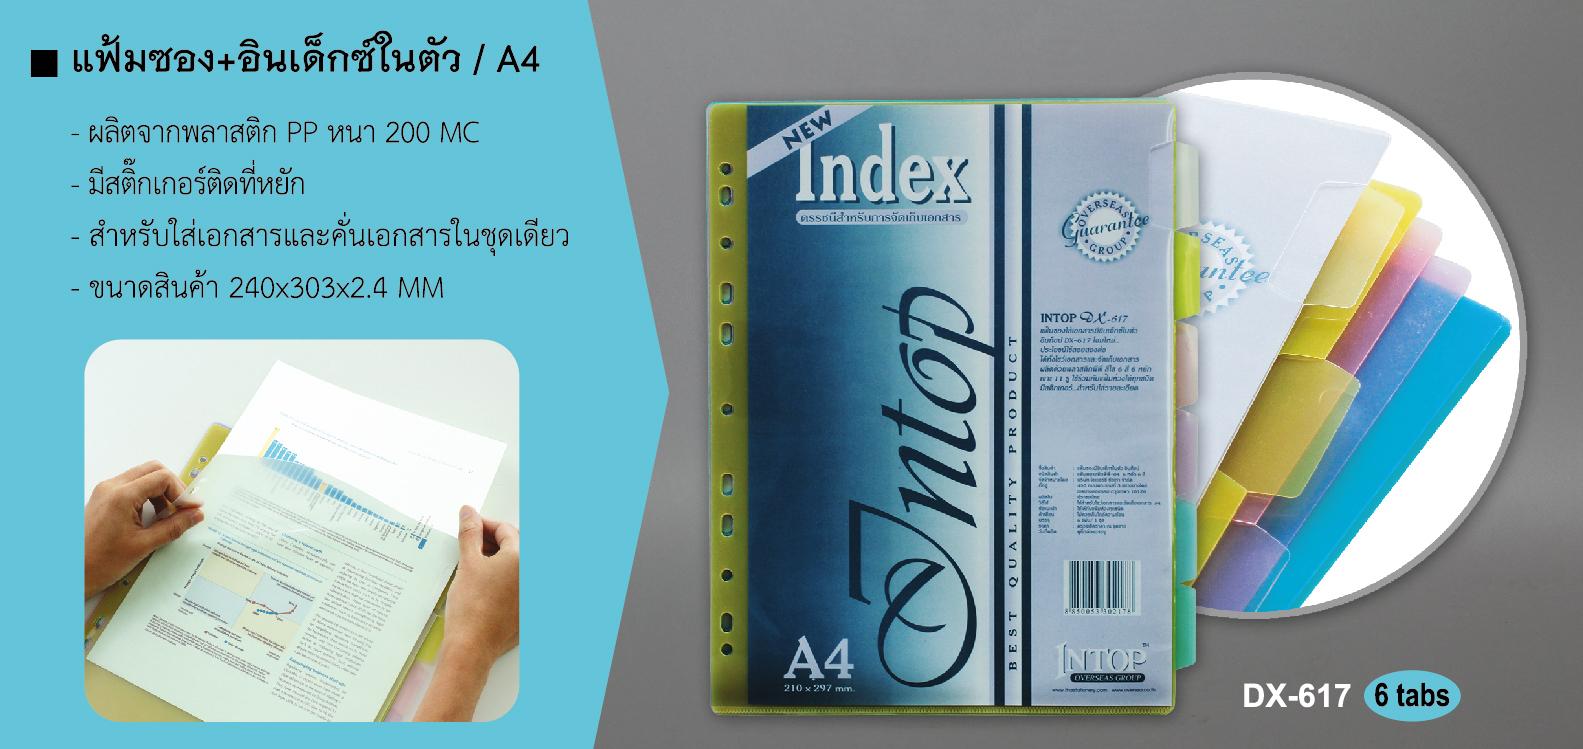 plastic, index, divider, file, ที่คั่นแฟ้ม, ที่คั่นเอกสาร, อินเด็กซ์